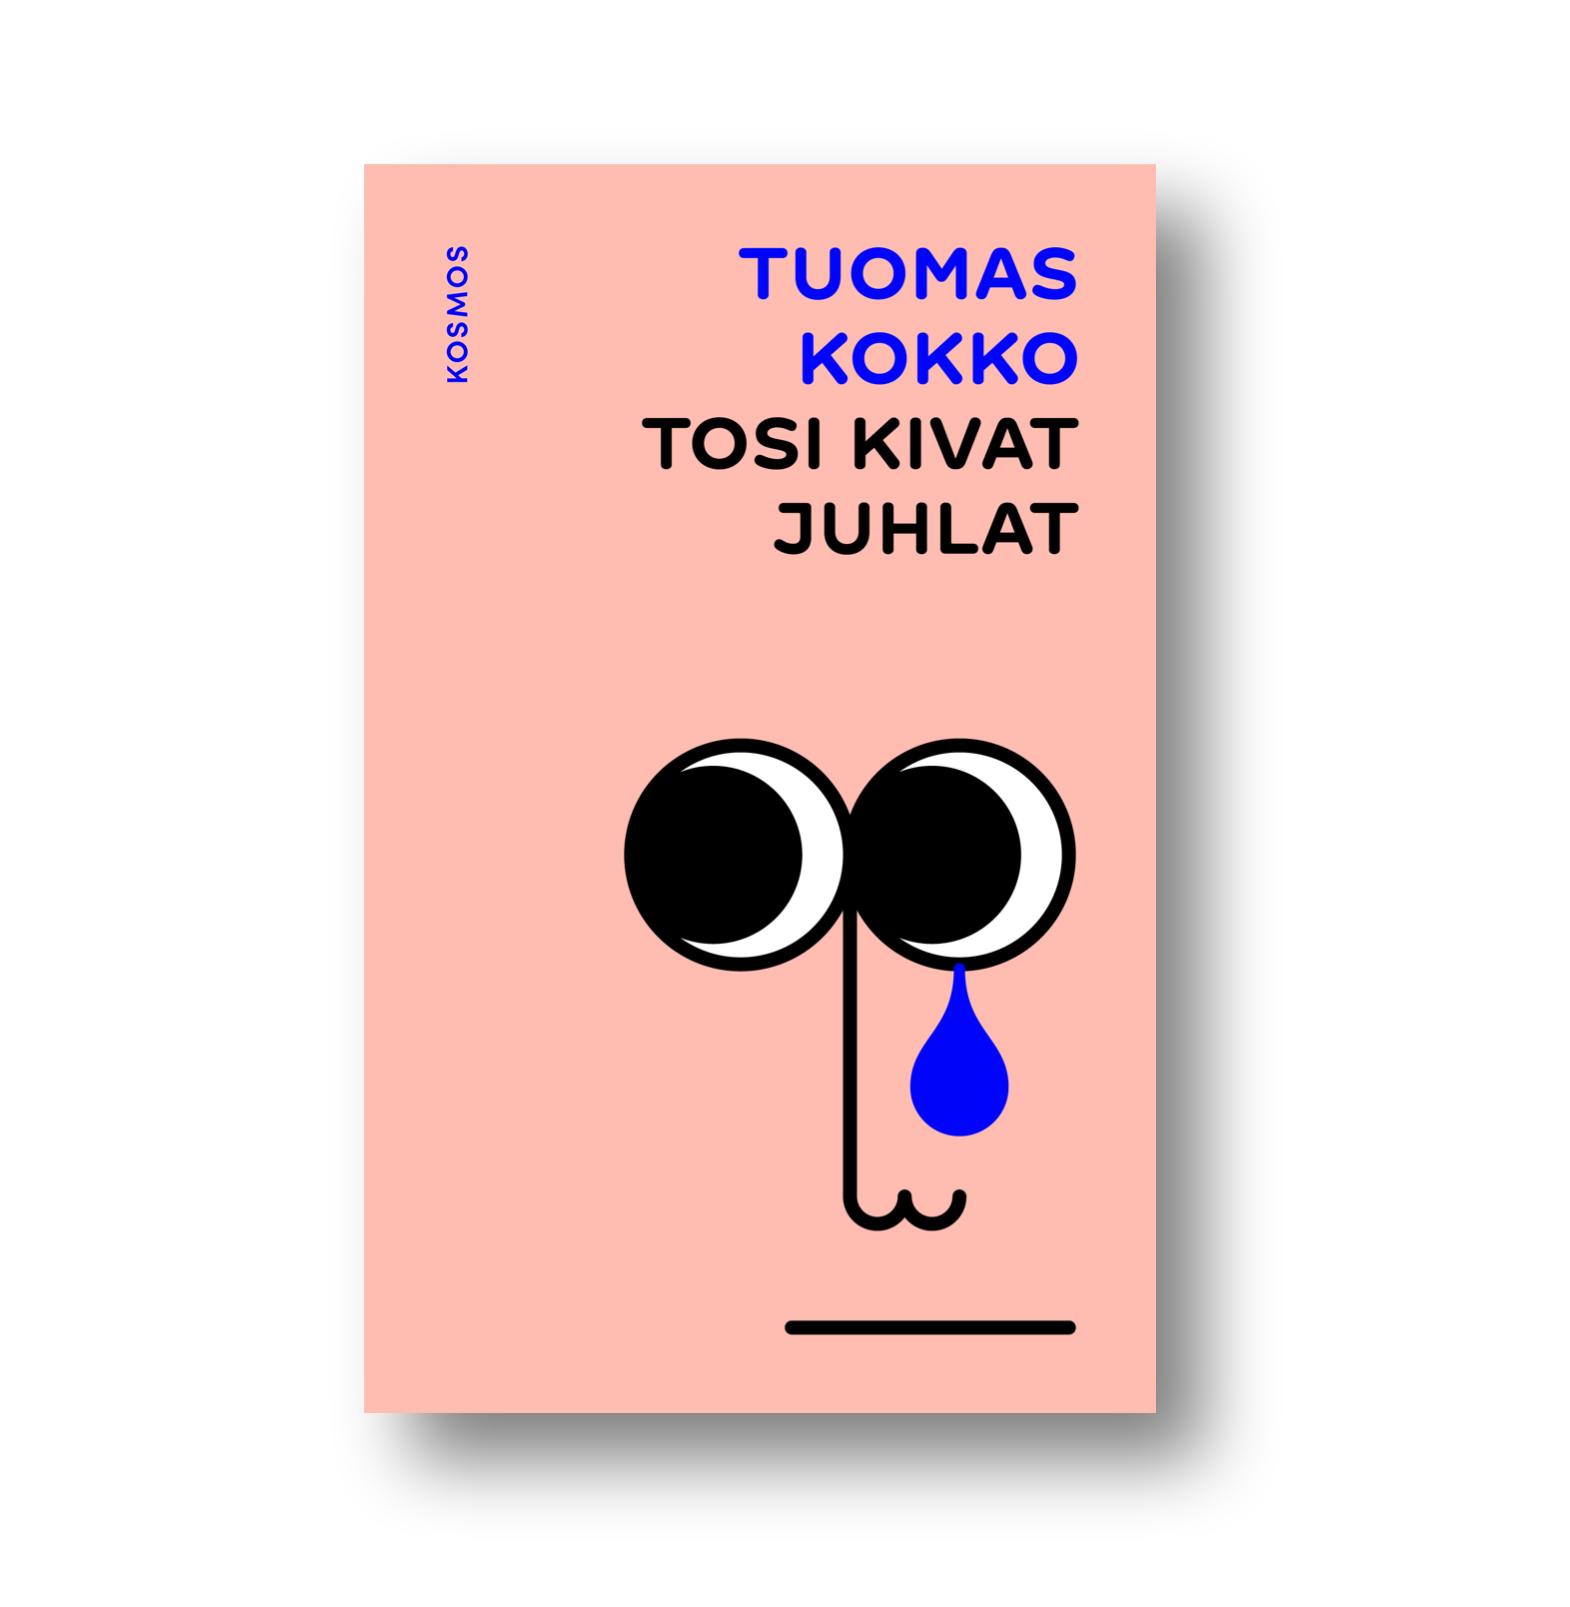 tosikivatjuhlat_neliö.png